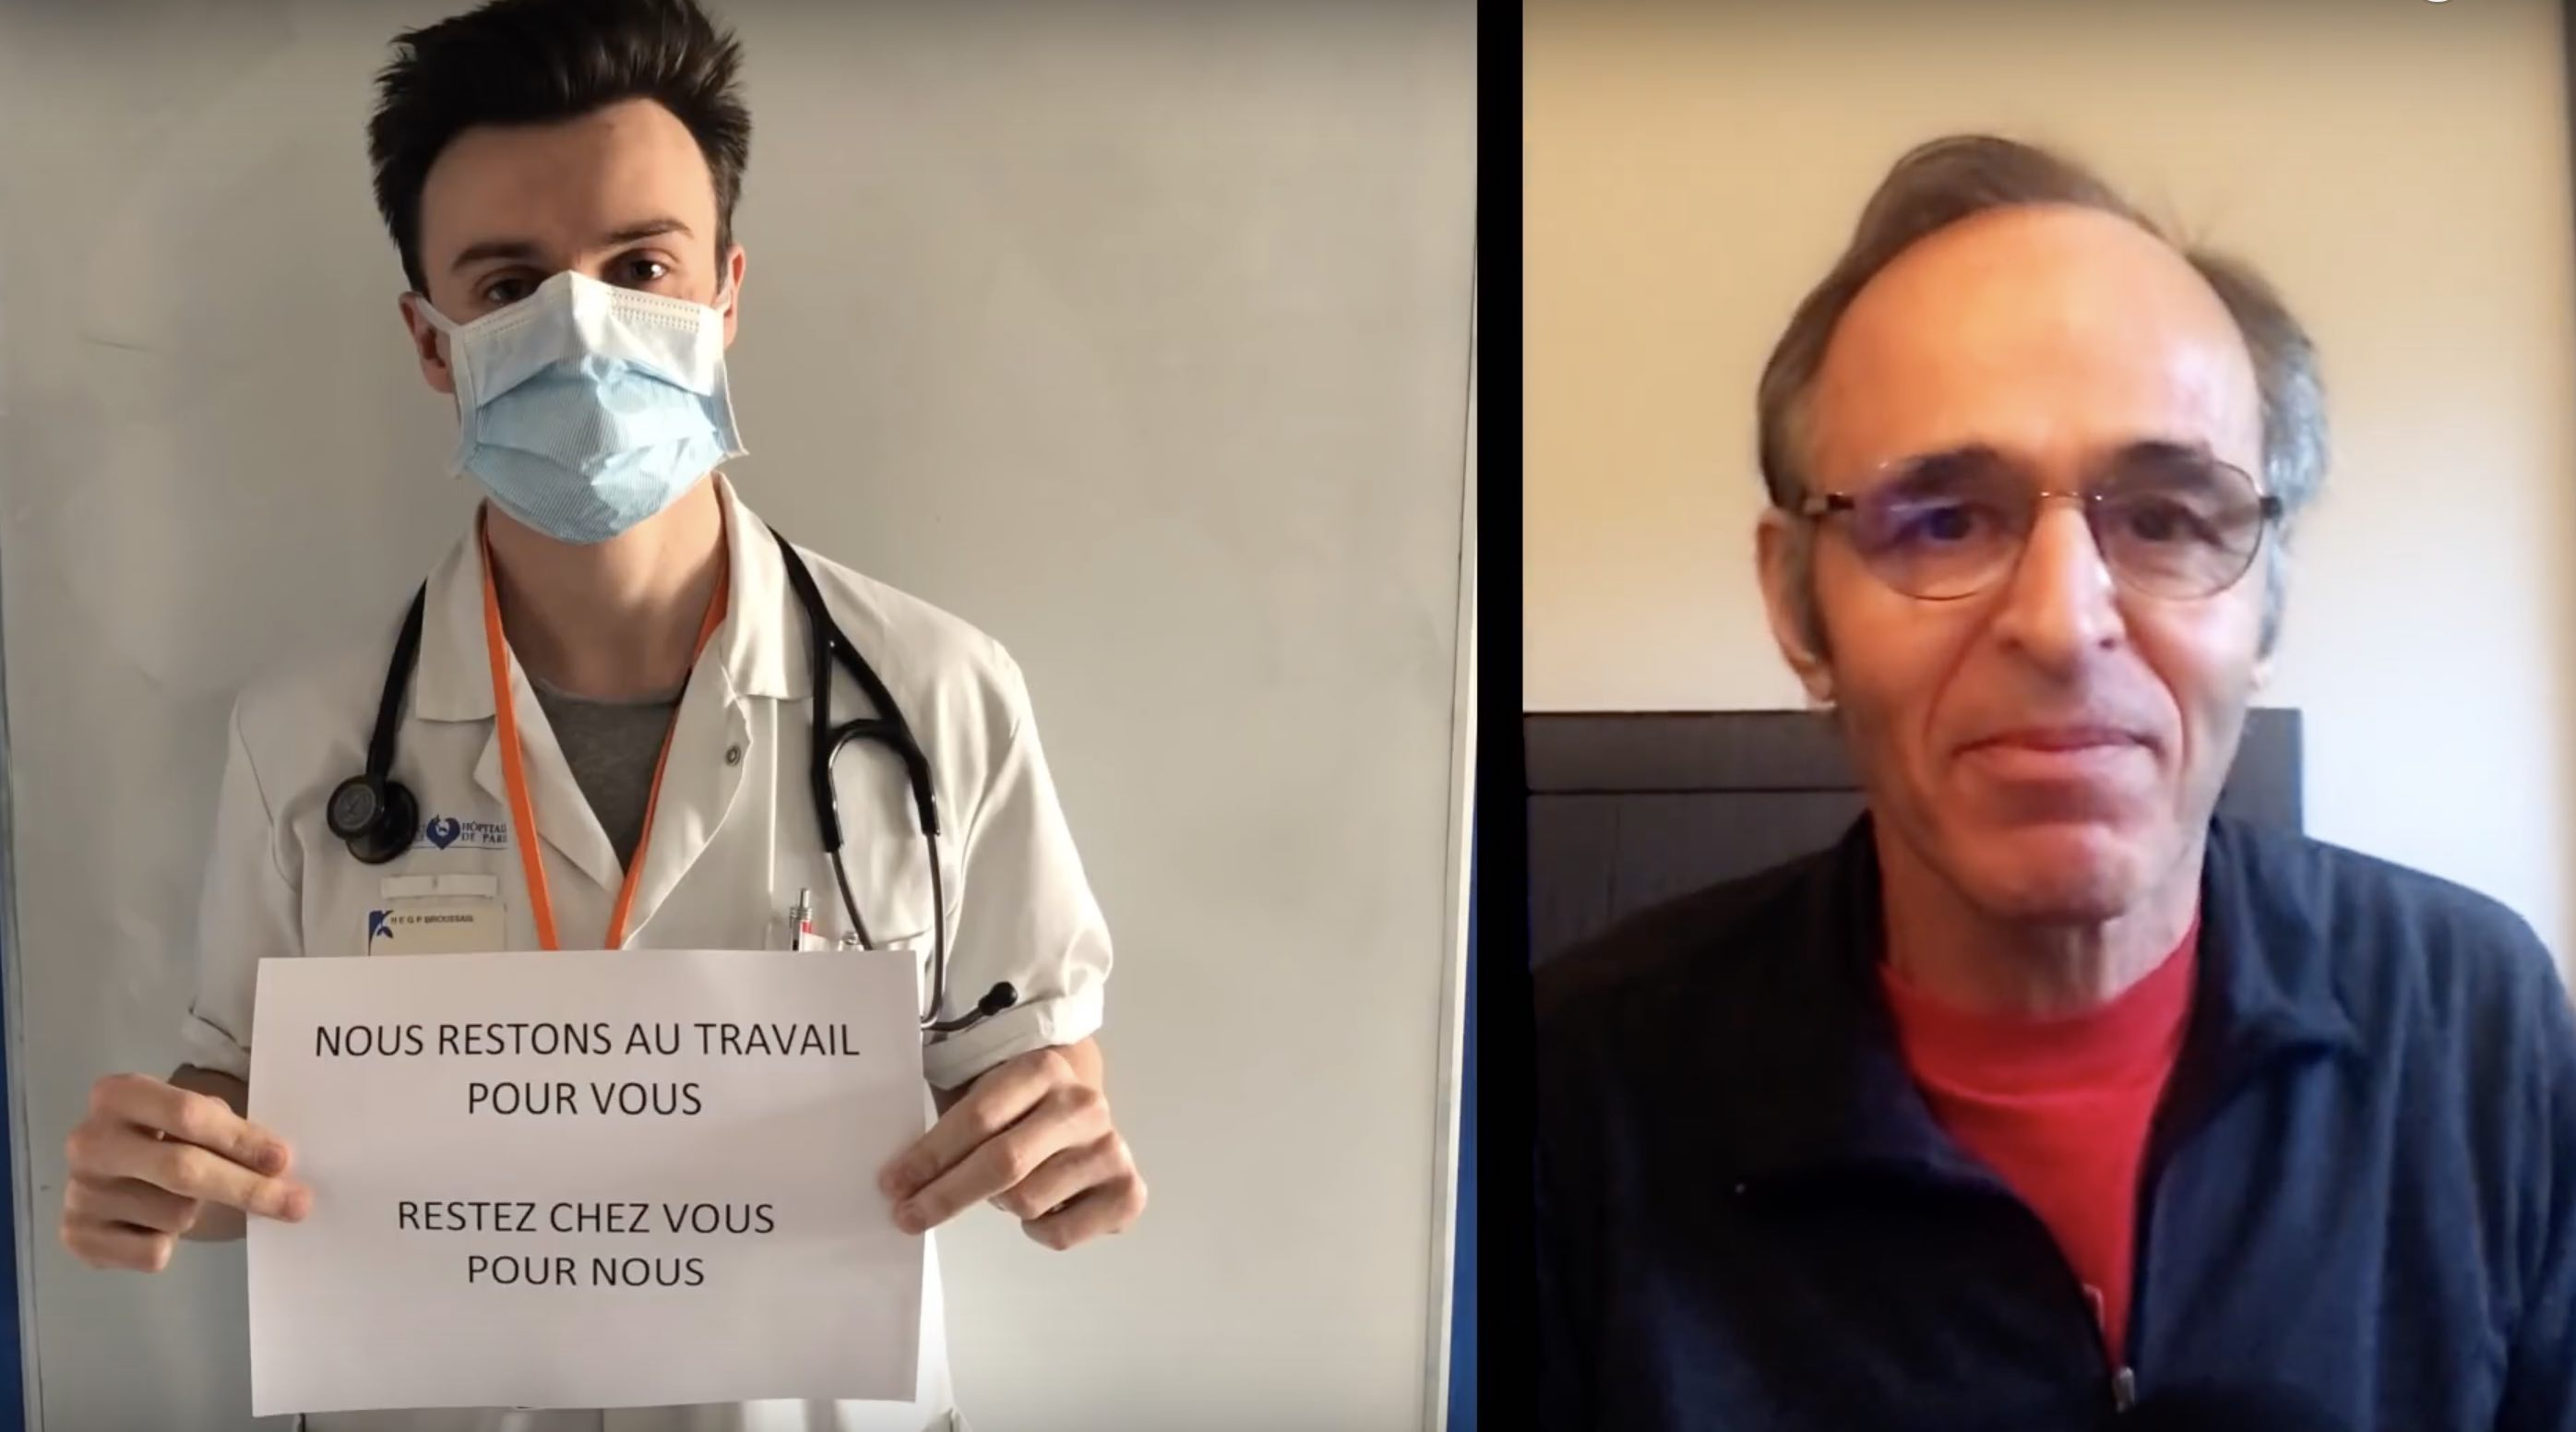 JJ Goldman - hommage - ils sauvent nos vies